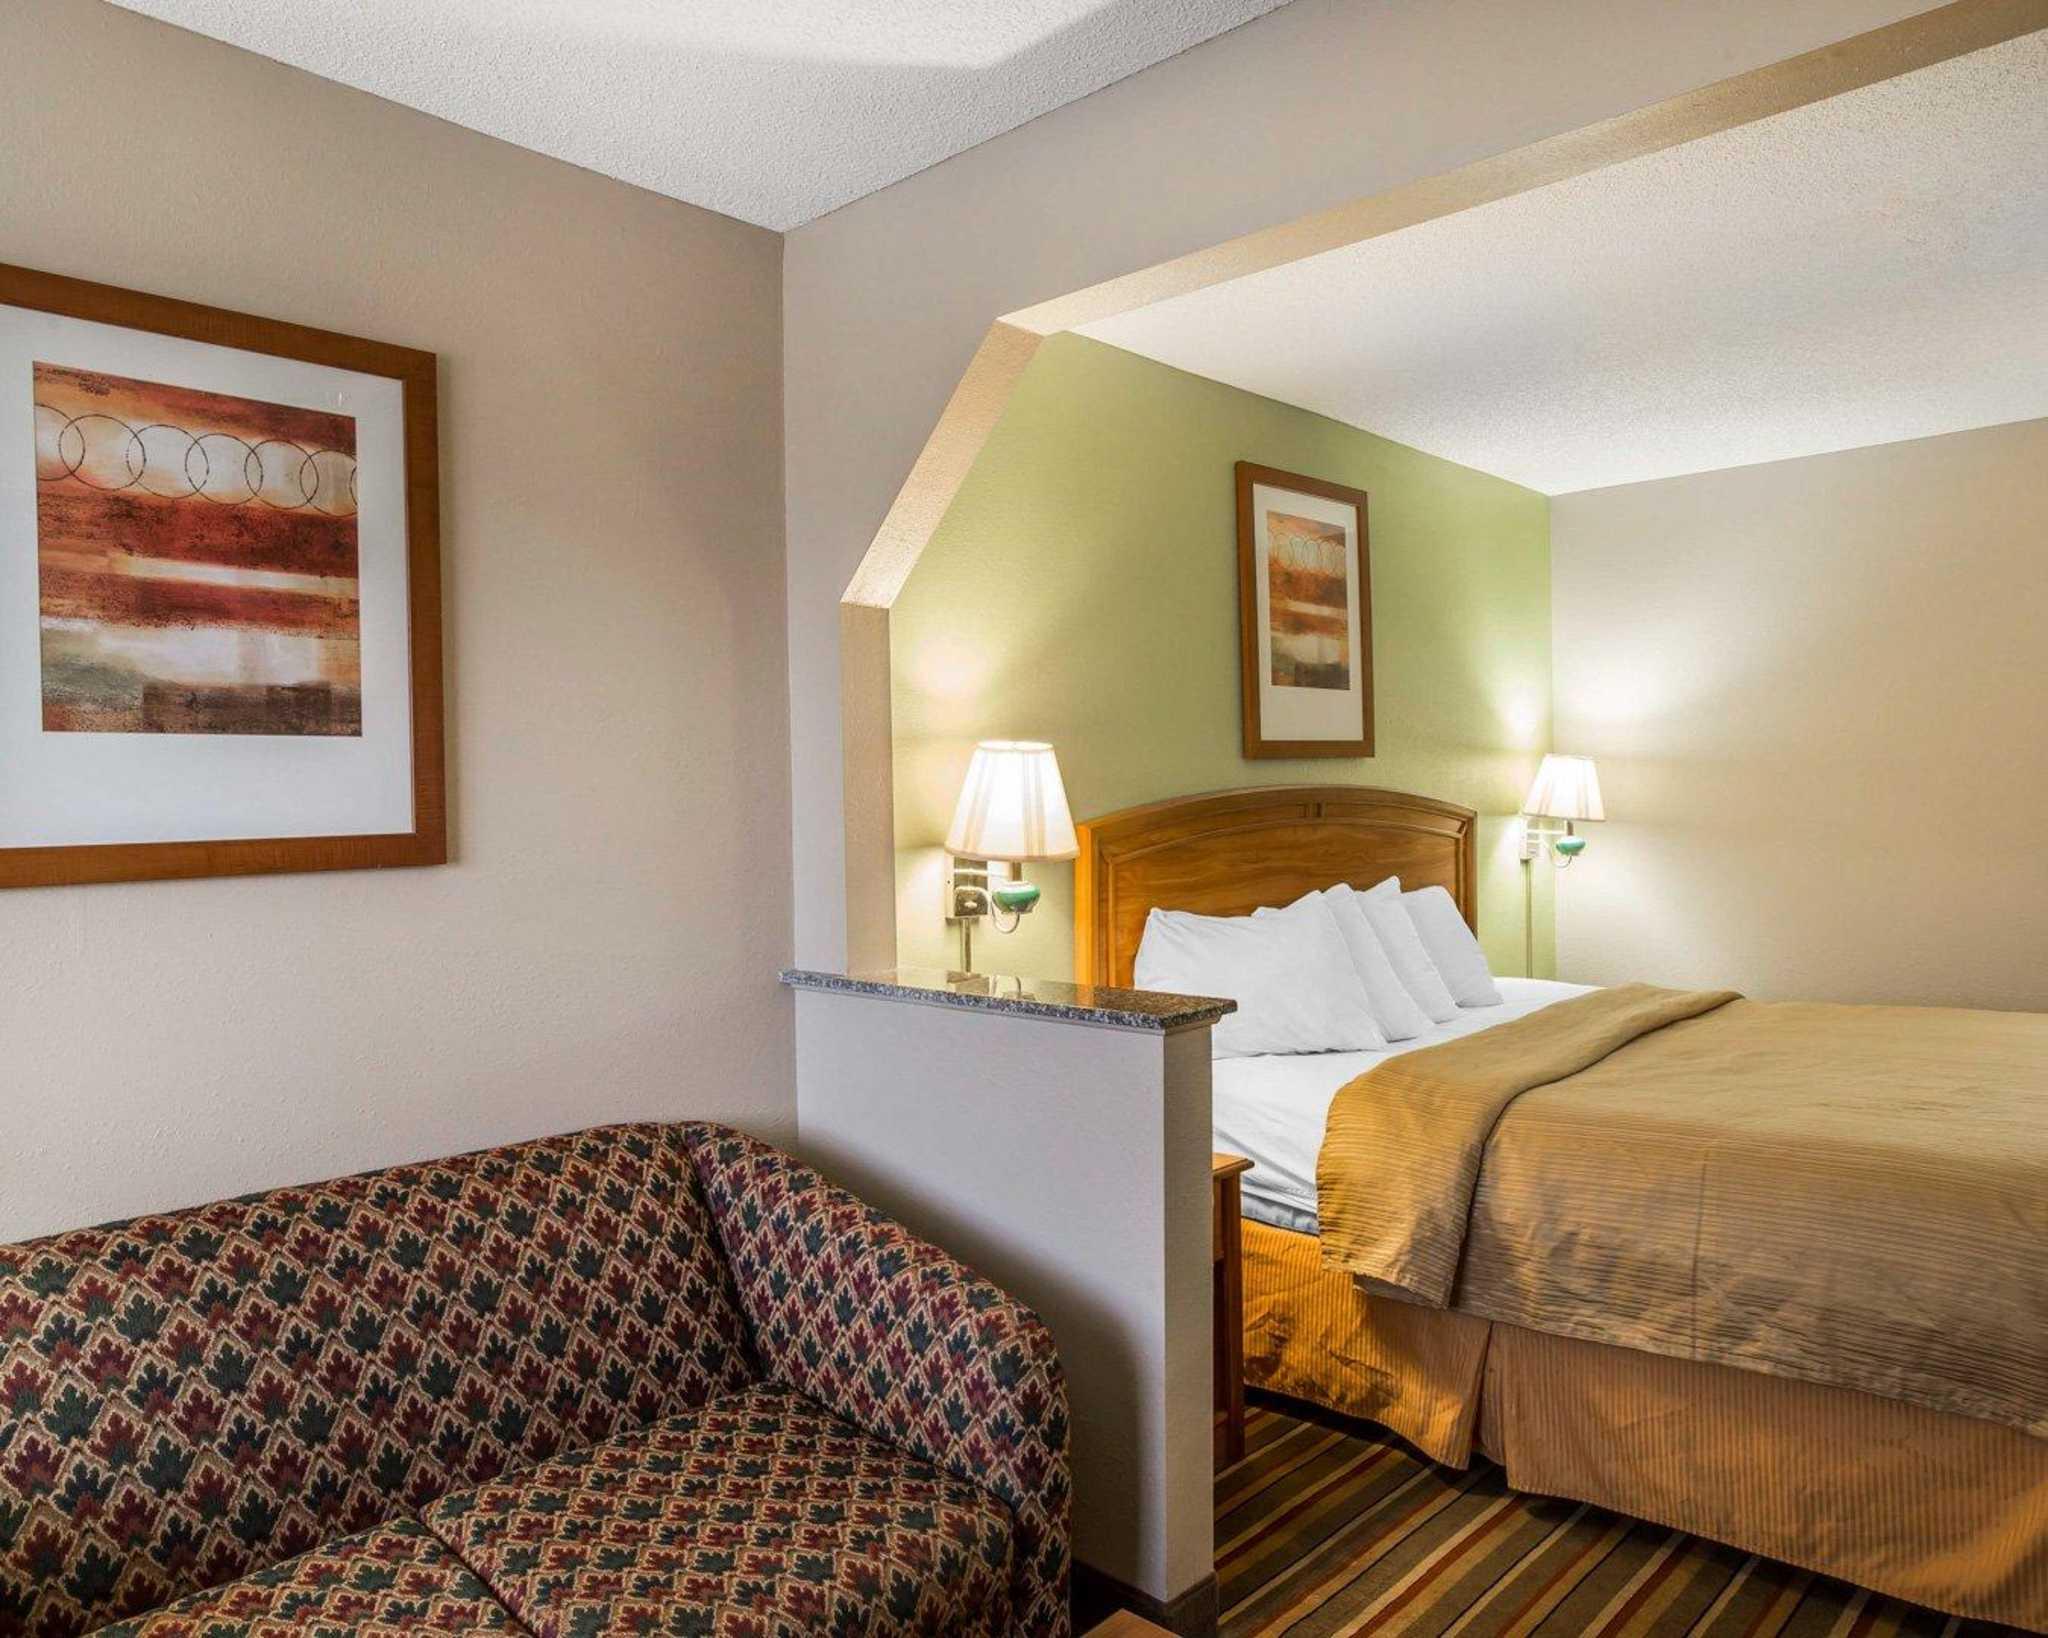 Quality Inn & Suites Dublin image 4